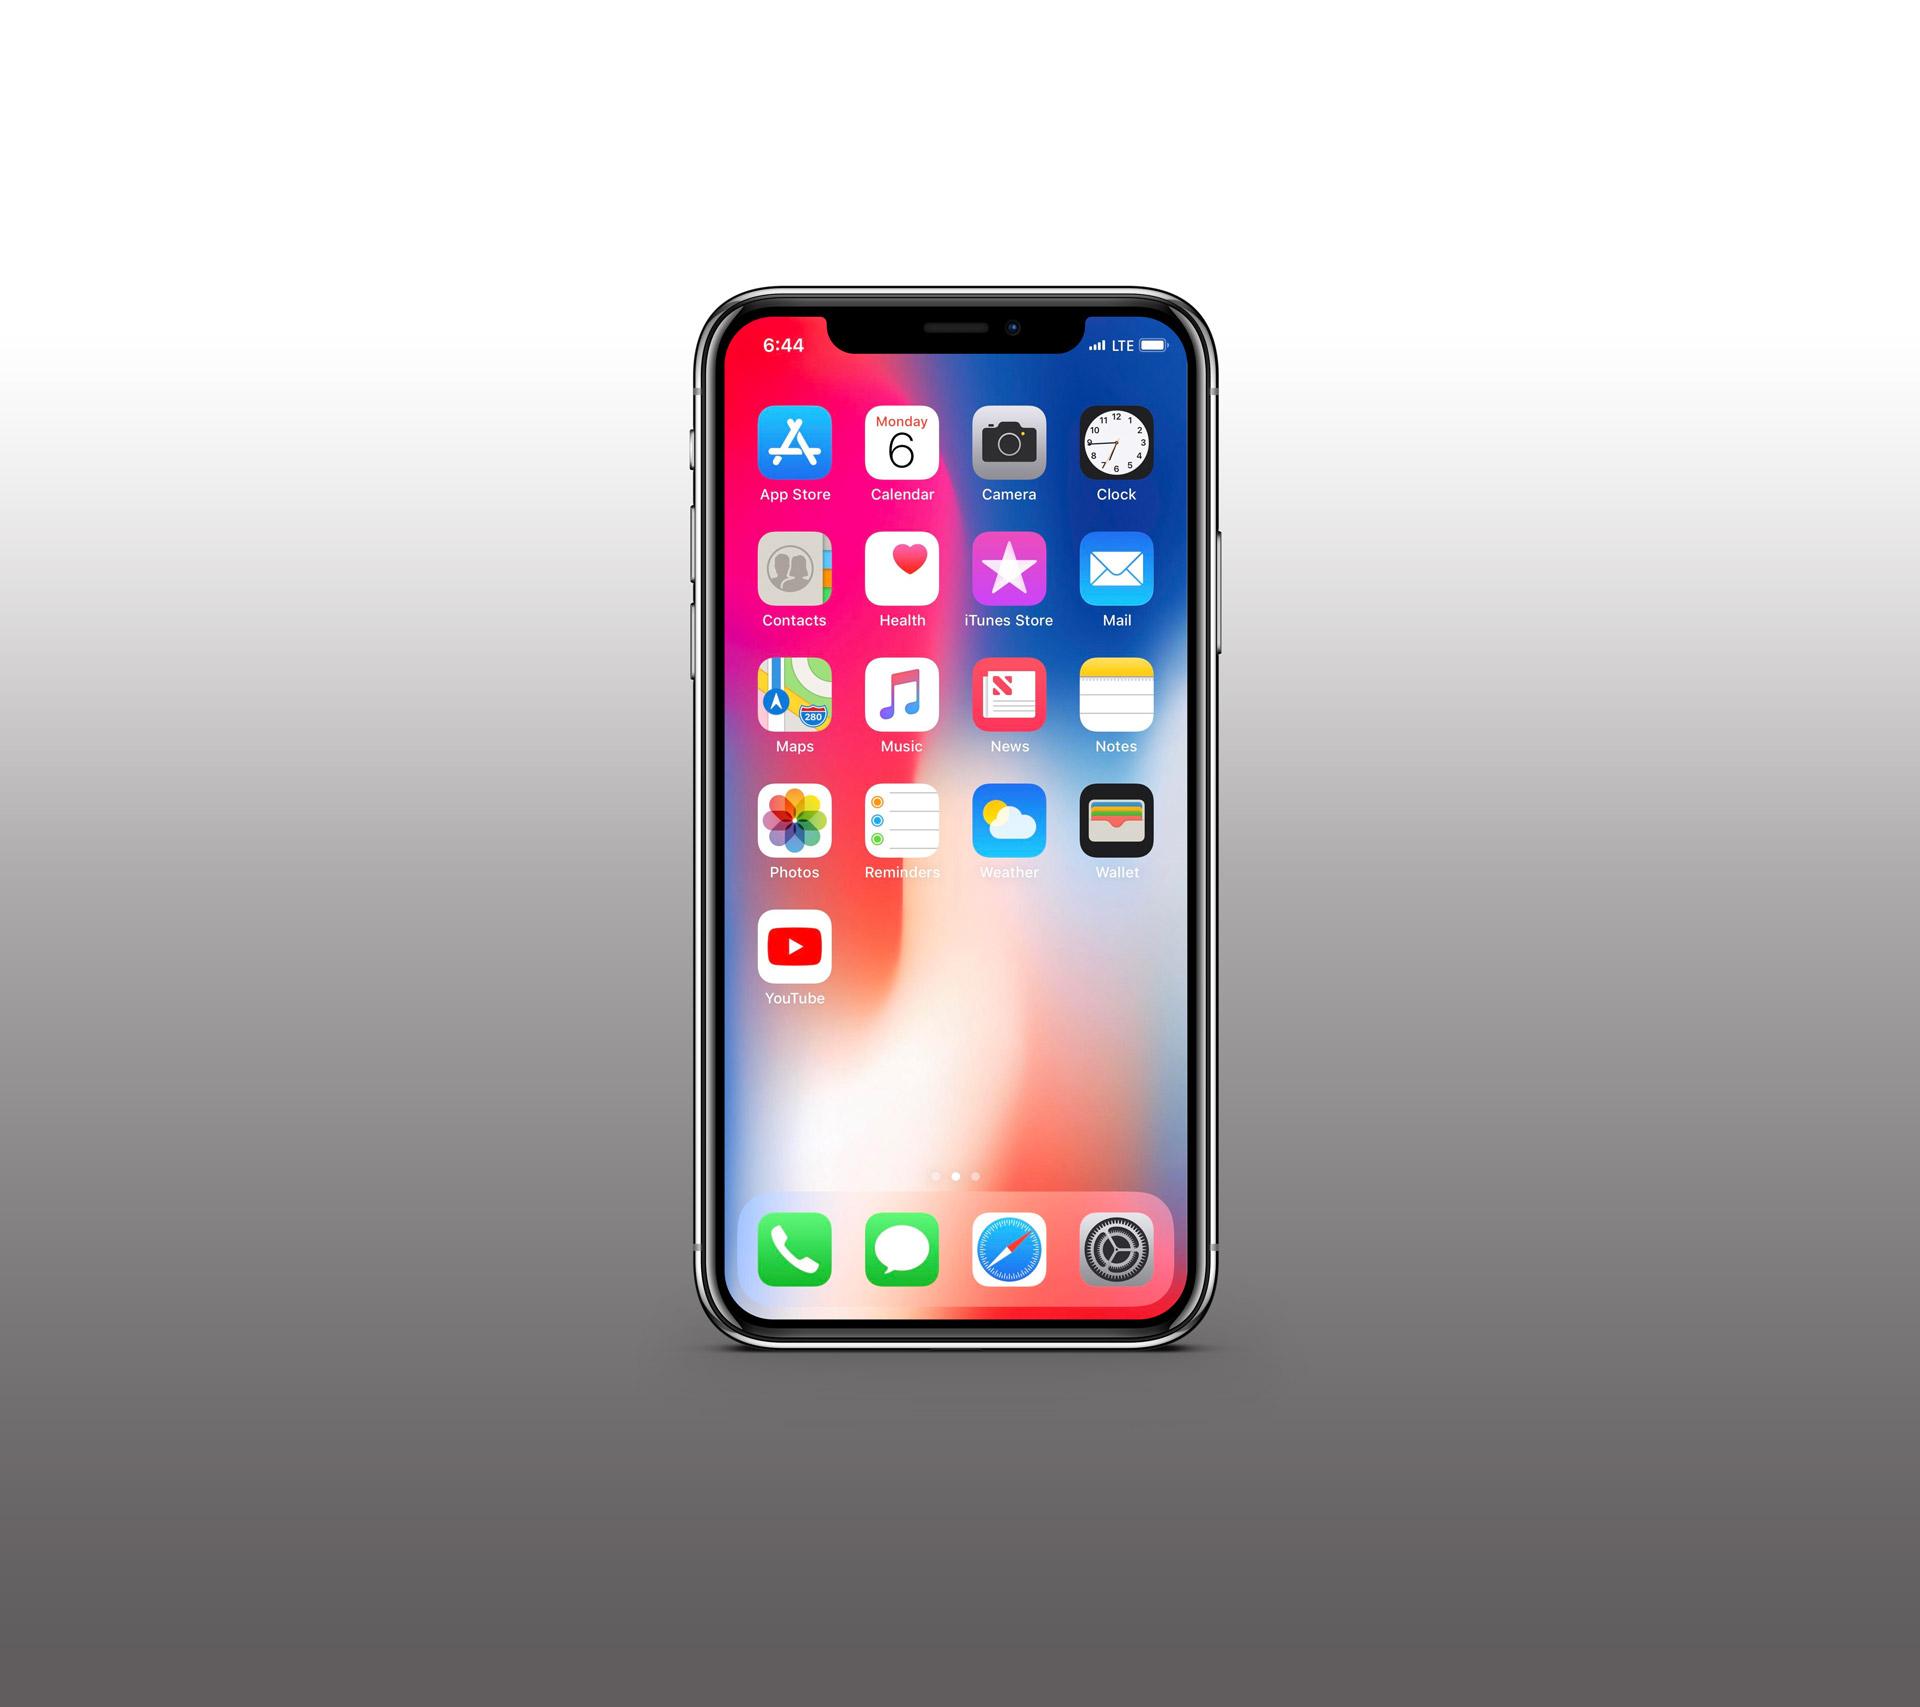 iphone x clean